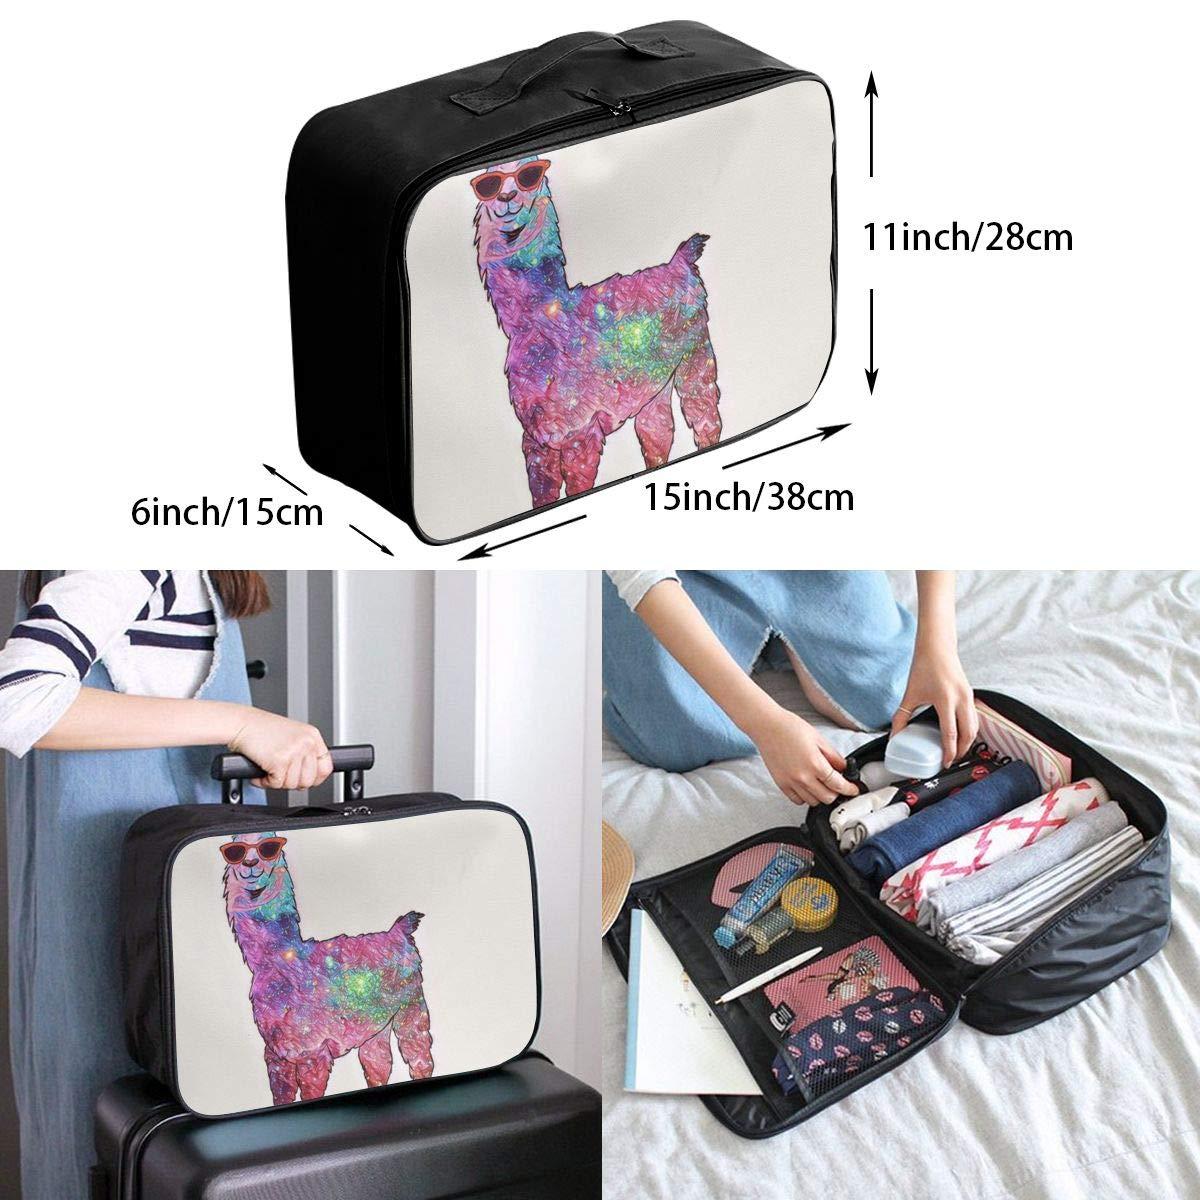 Cartoon Nebula Stars In Llama Travel Lightweight Waterproof Foldable Storage Portable Luggage Duffle Tote Bag Large Capacity In Trolley Handle Bags 6x11x15 Inch